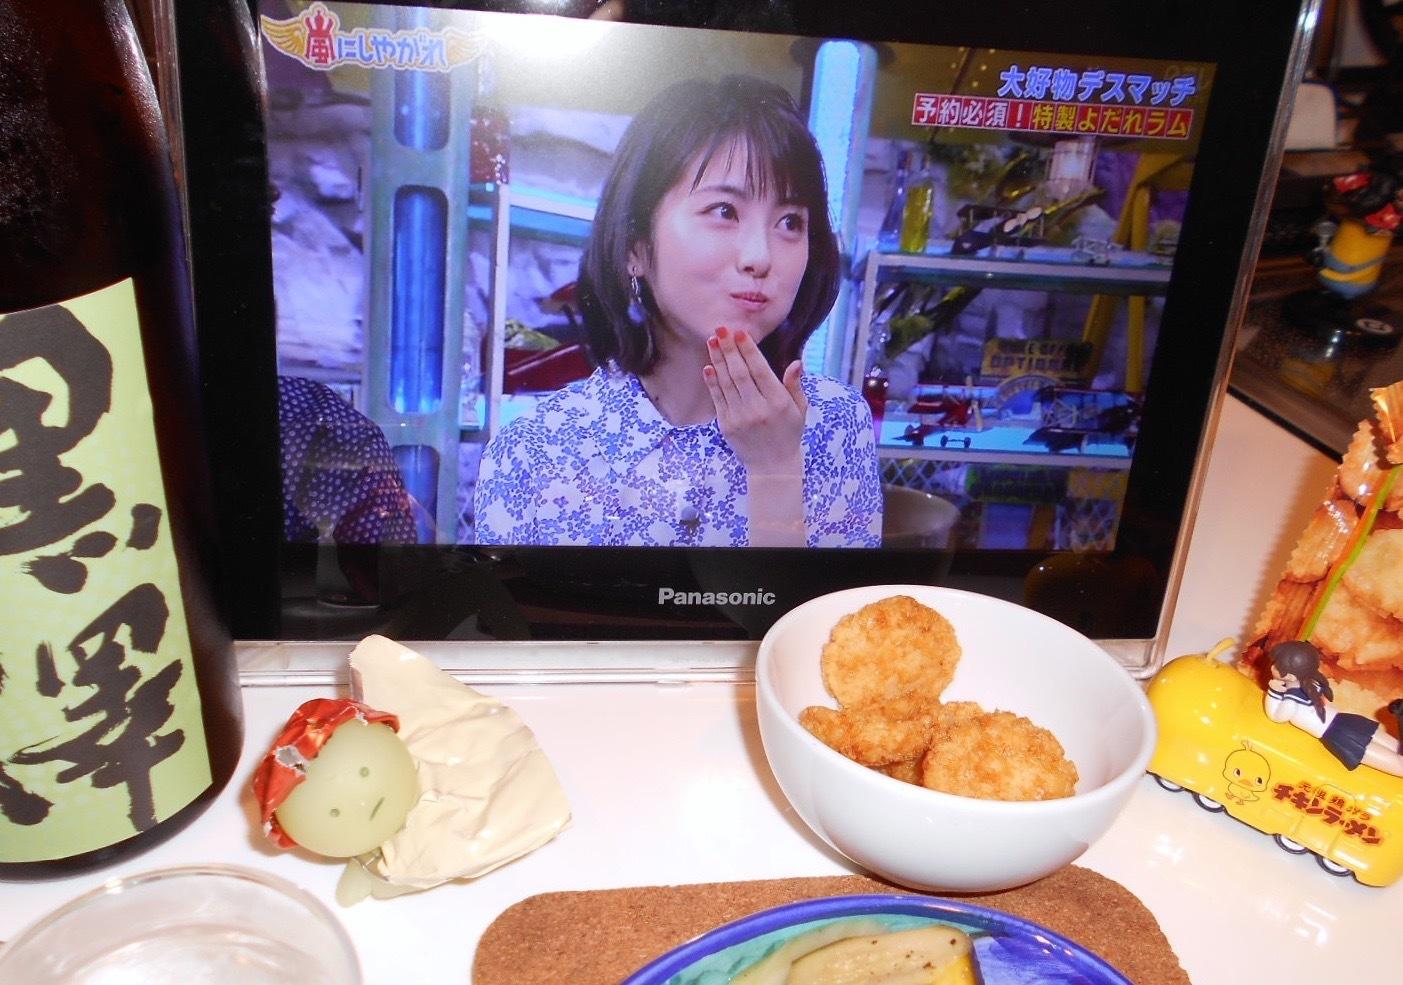 kurosawa_type-s30by2_4.jpg